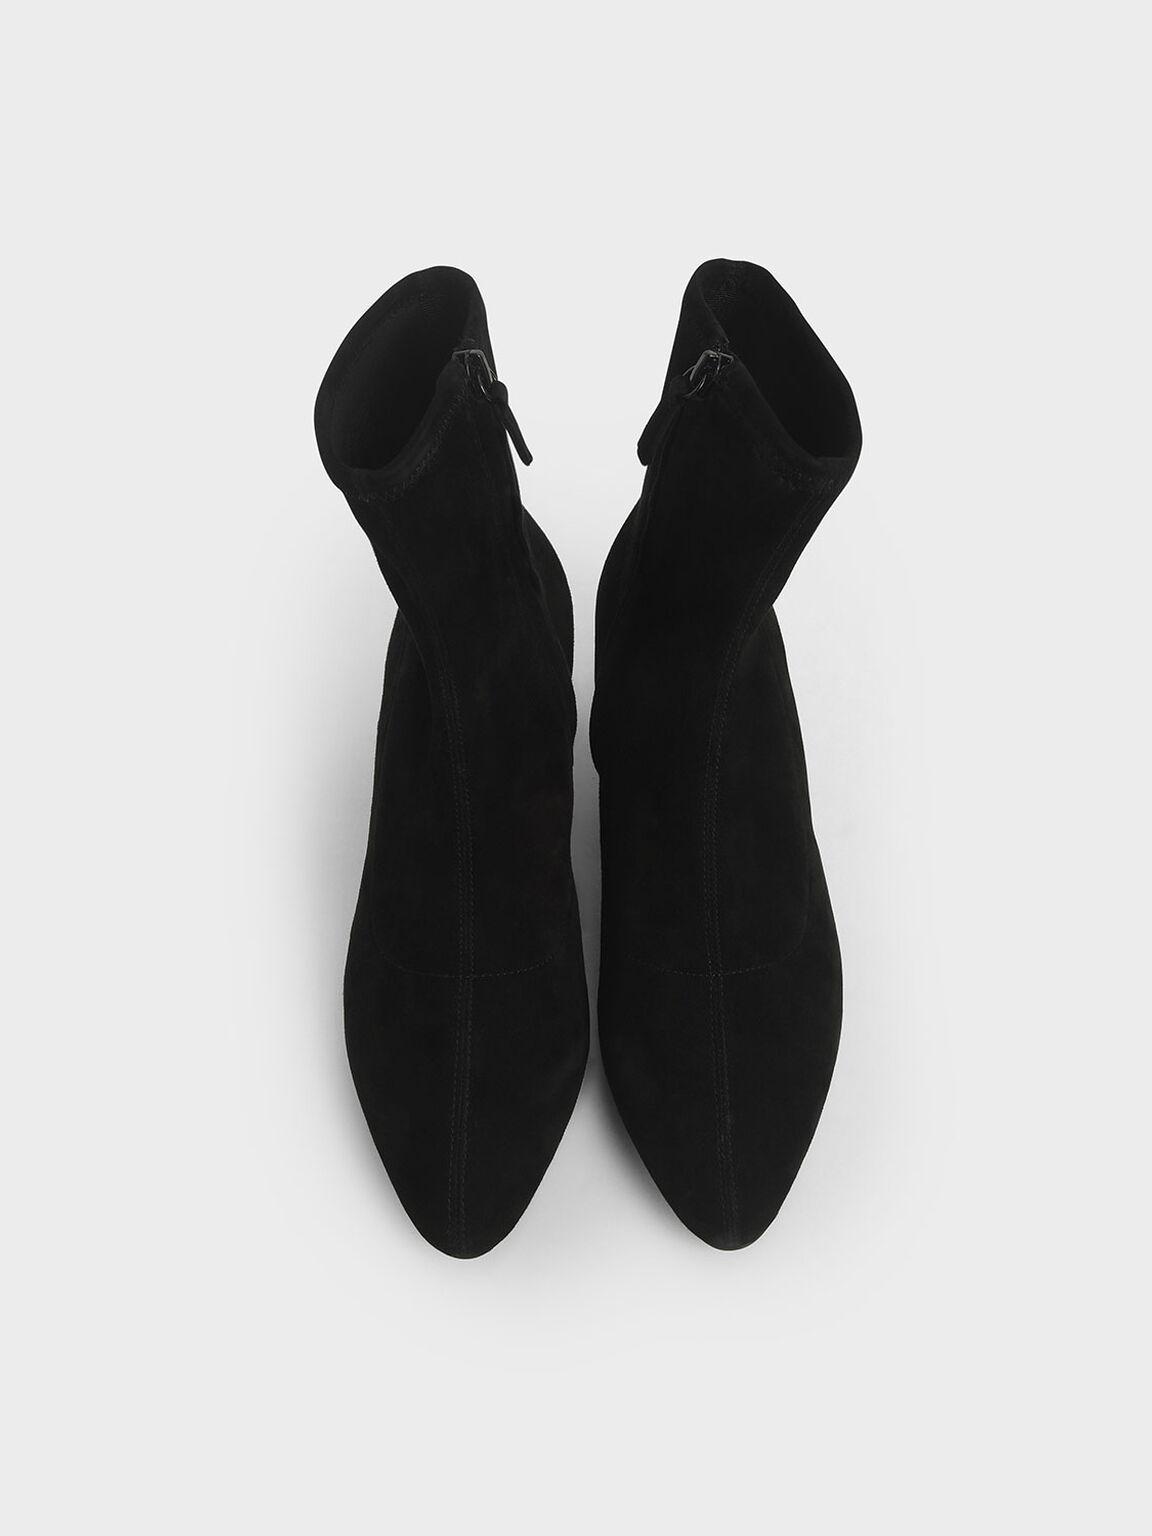 Sculptural Heel Ankle Boots (Kid Suede), Black Textured, hi-res